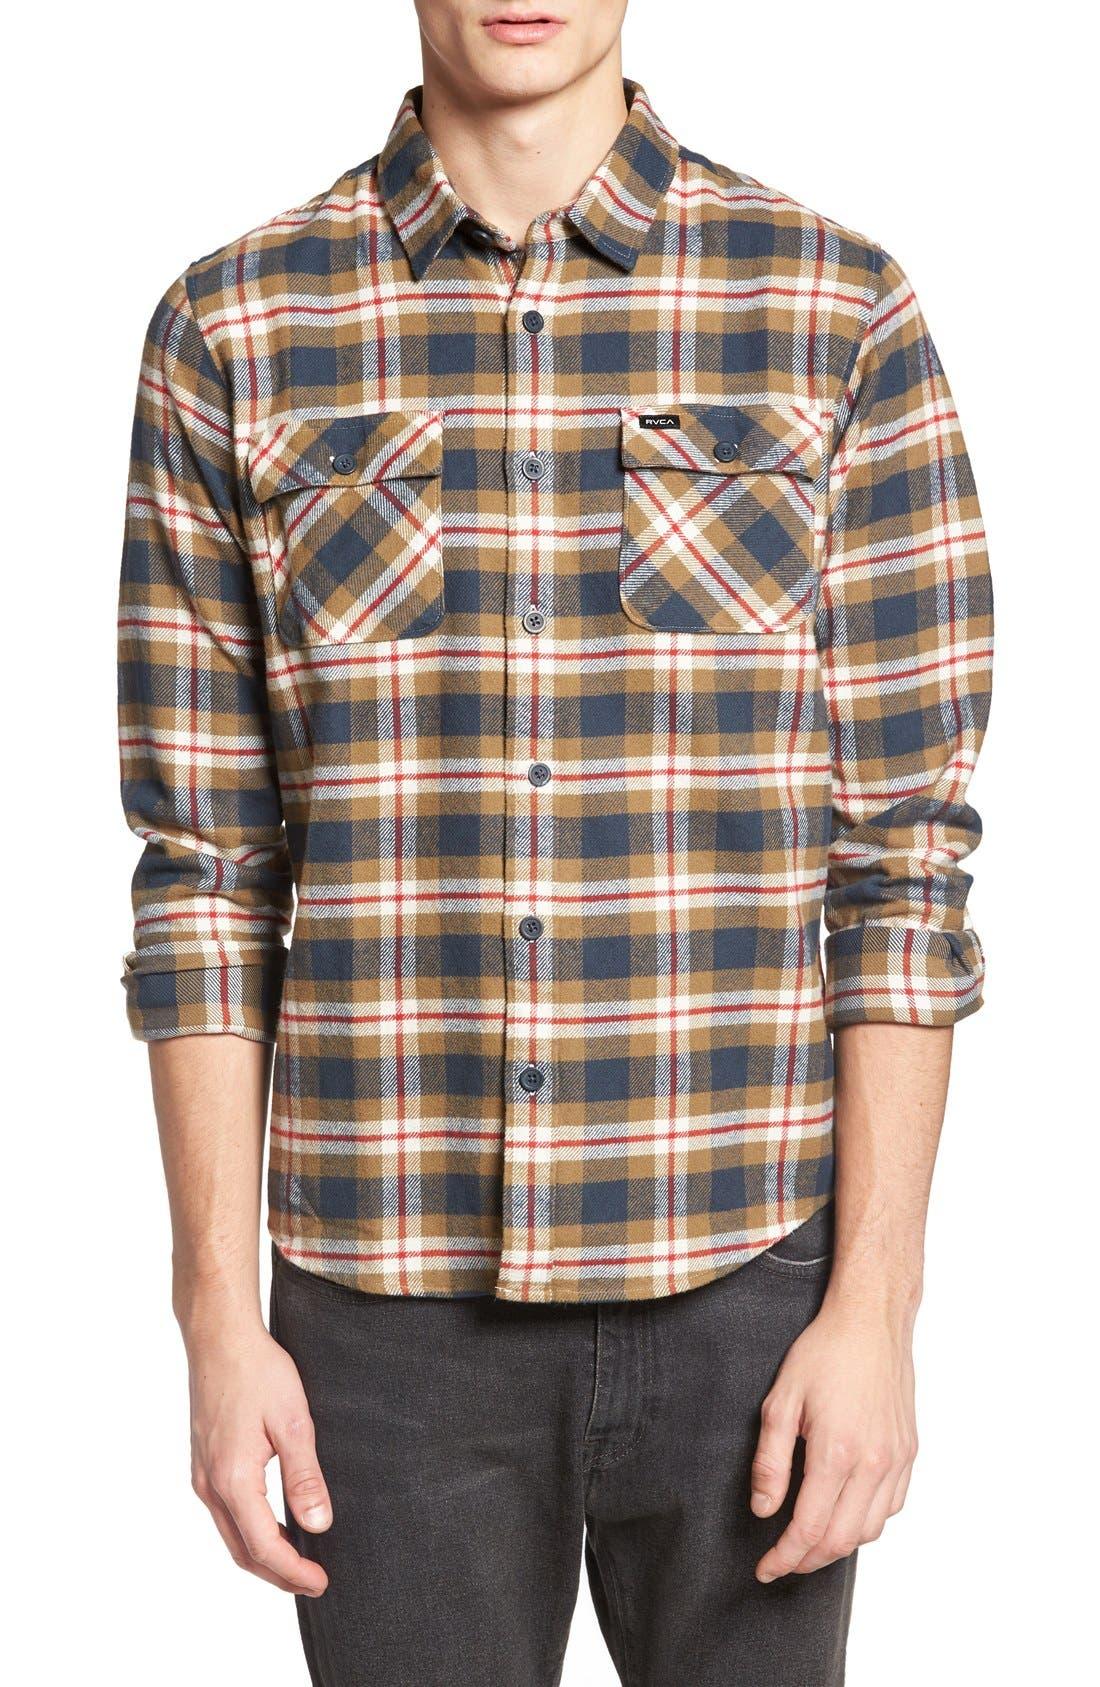 'That'll Work' Trim Fit Plaid Flannel Shirt,                             Main thumbnail 5, color,